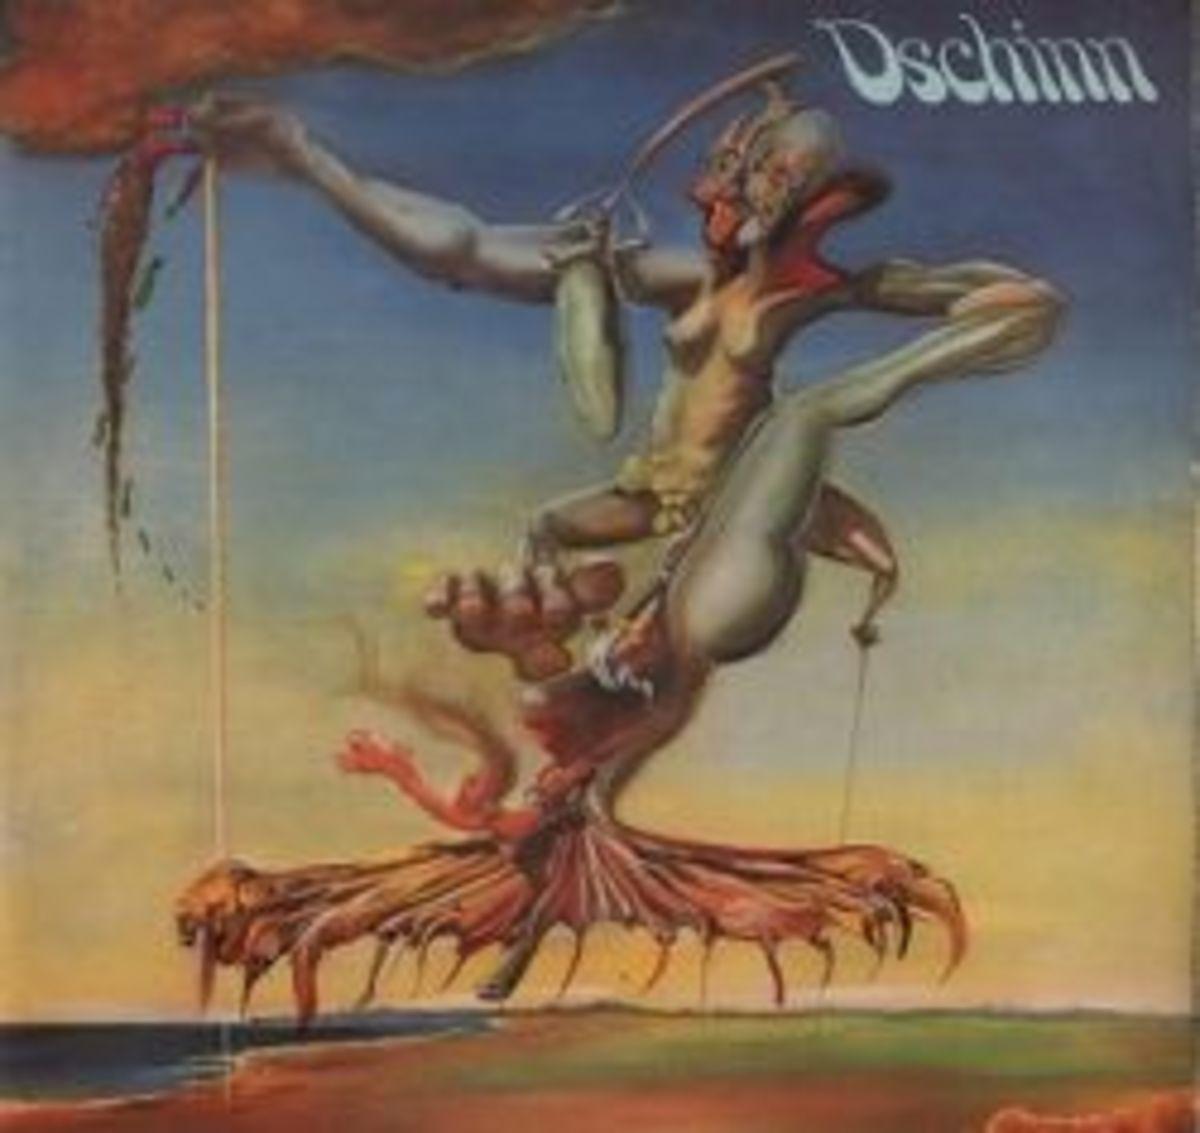 "Dschinn ""Dschinn"" Bellaphon Bacillus Records BLPS 19120 12"" LP Vinyl Record German Pressing (1972)"